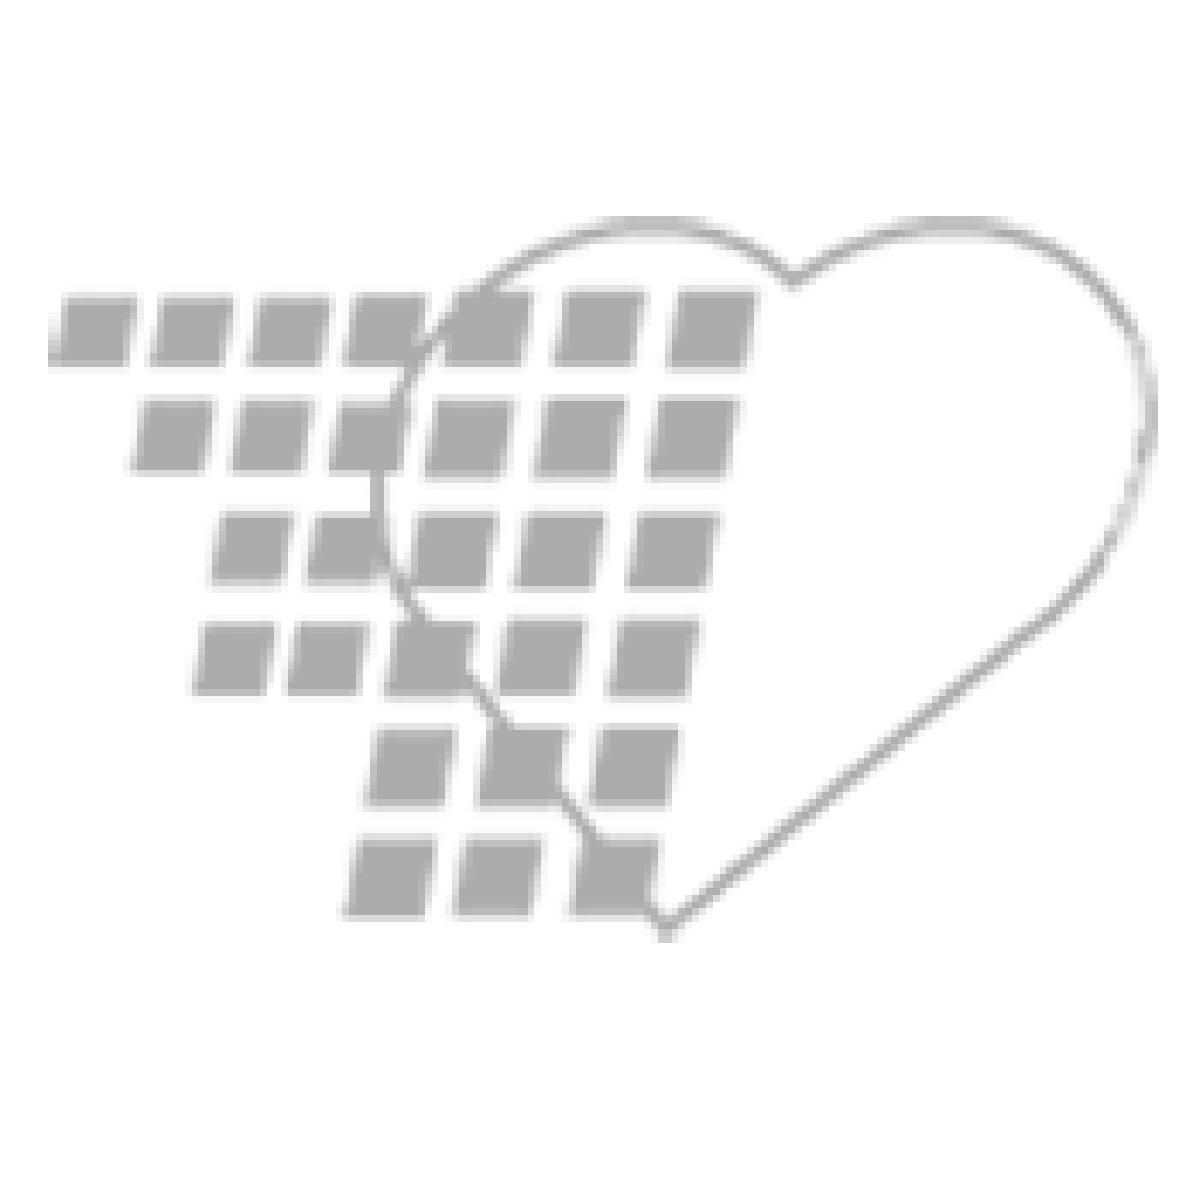 09-31-9819 Understanding Hypertension Chart